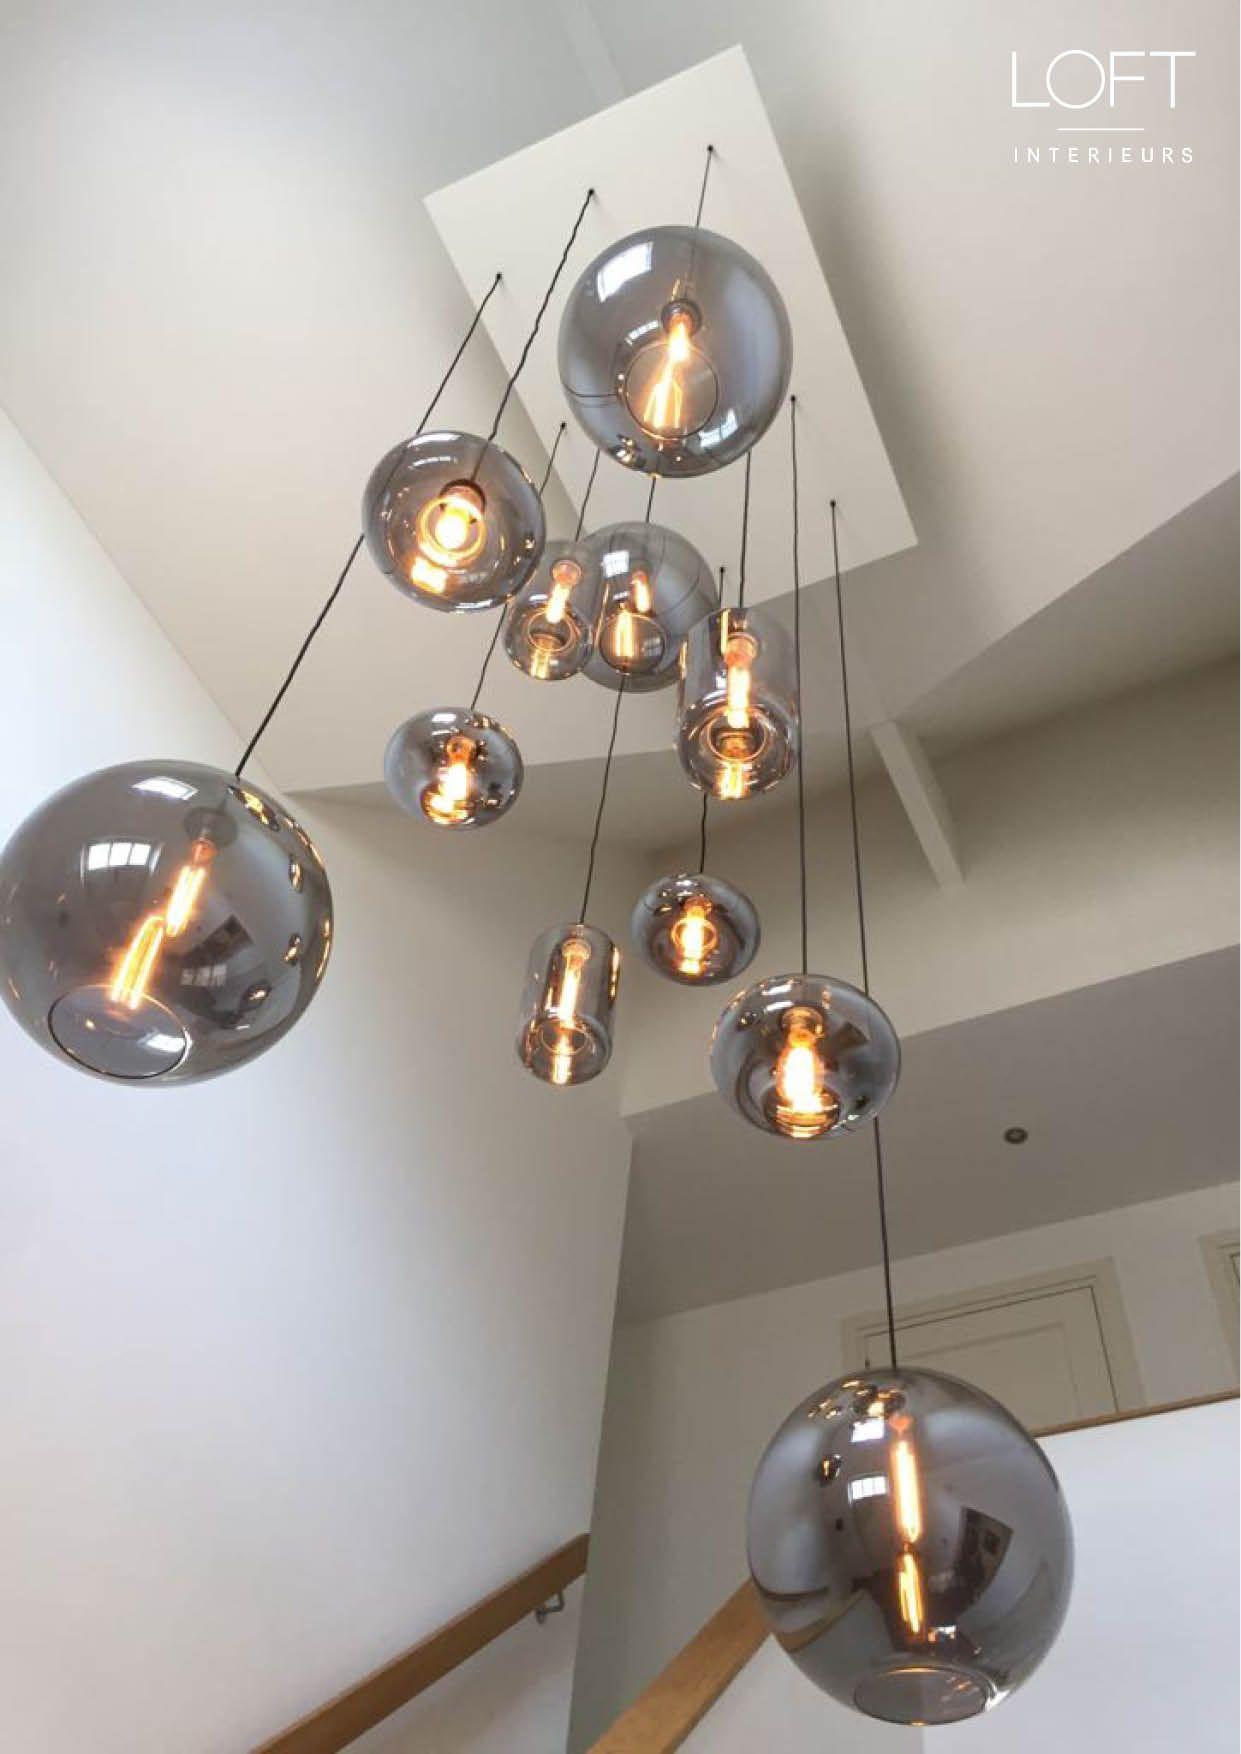 Loftinterieurs bulbs lighting vide project lamptecho for Lampen en verlichting